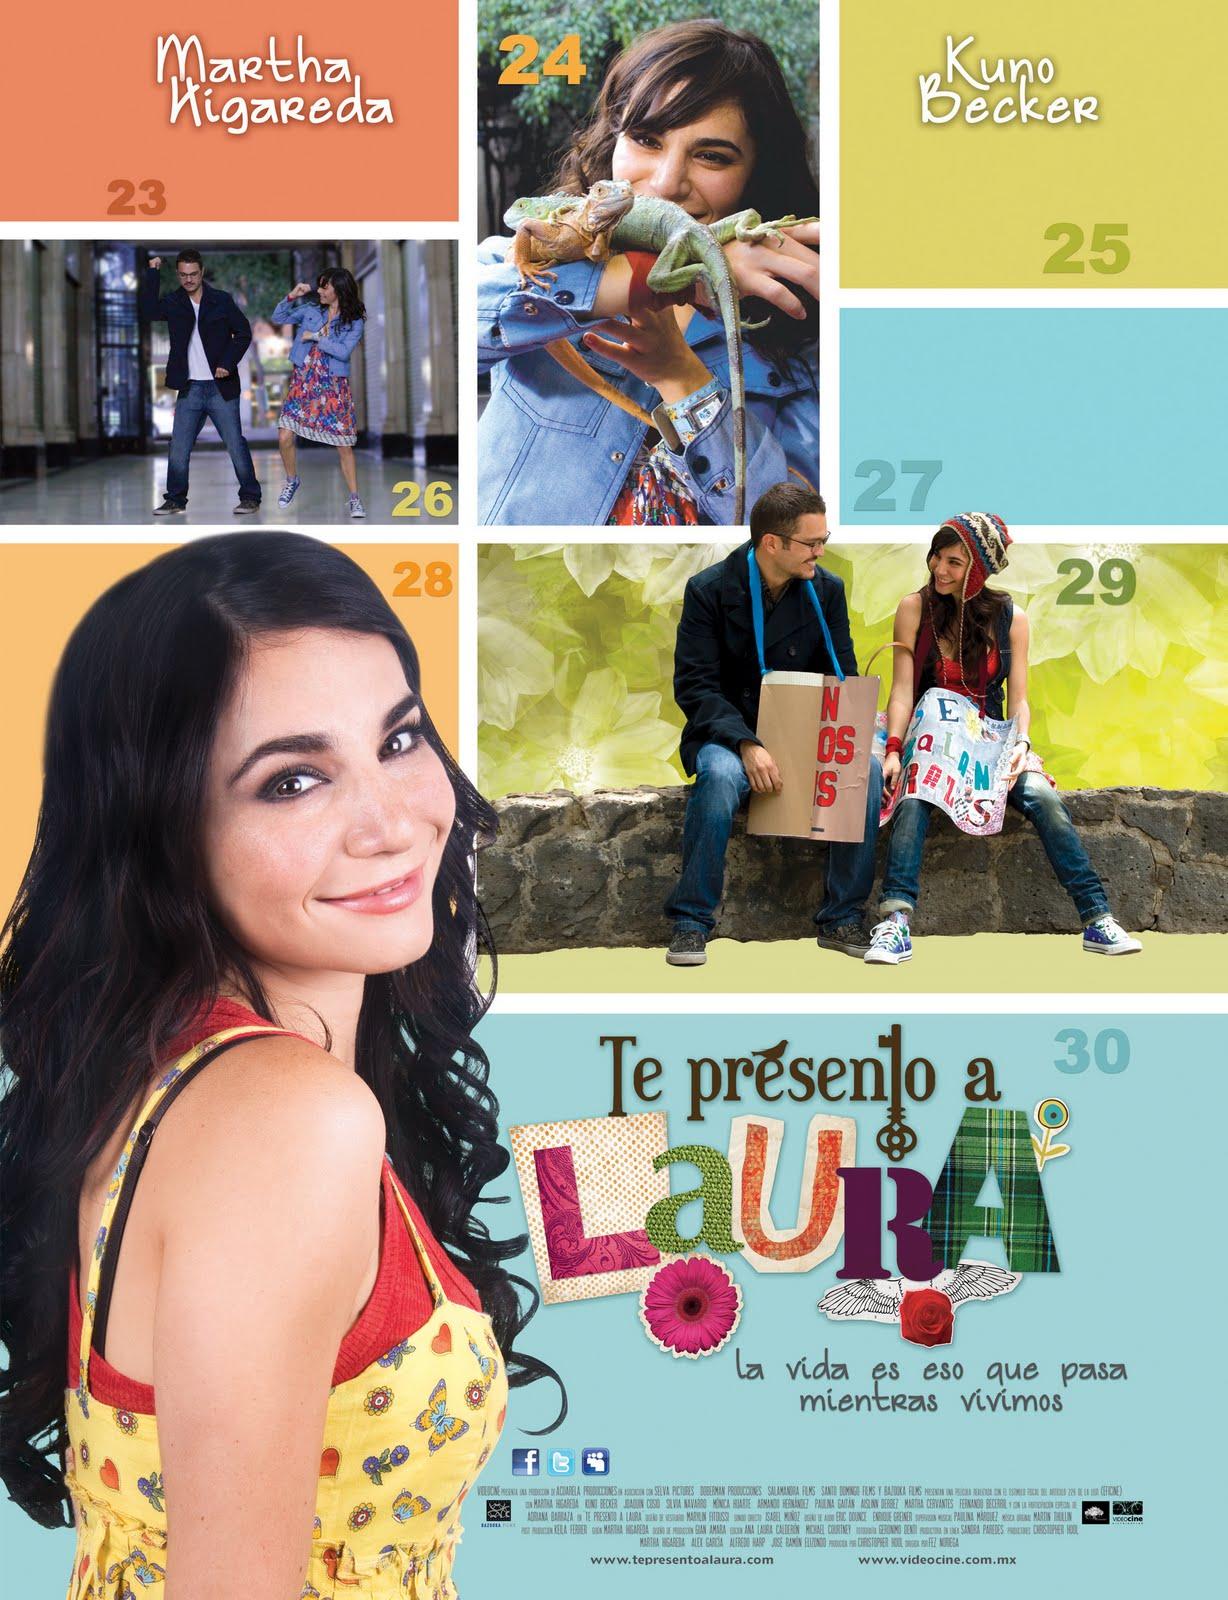 Te presento a Laura (DvdRip) (Español Latino) (MG)